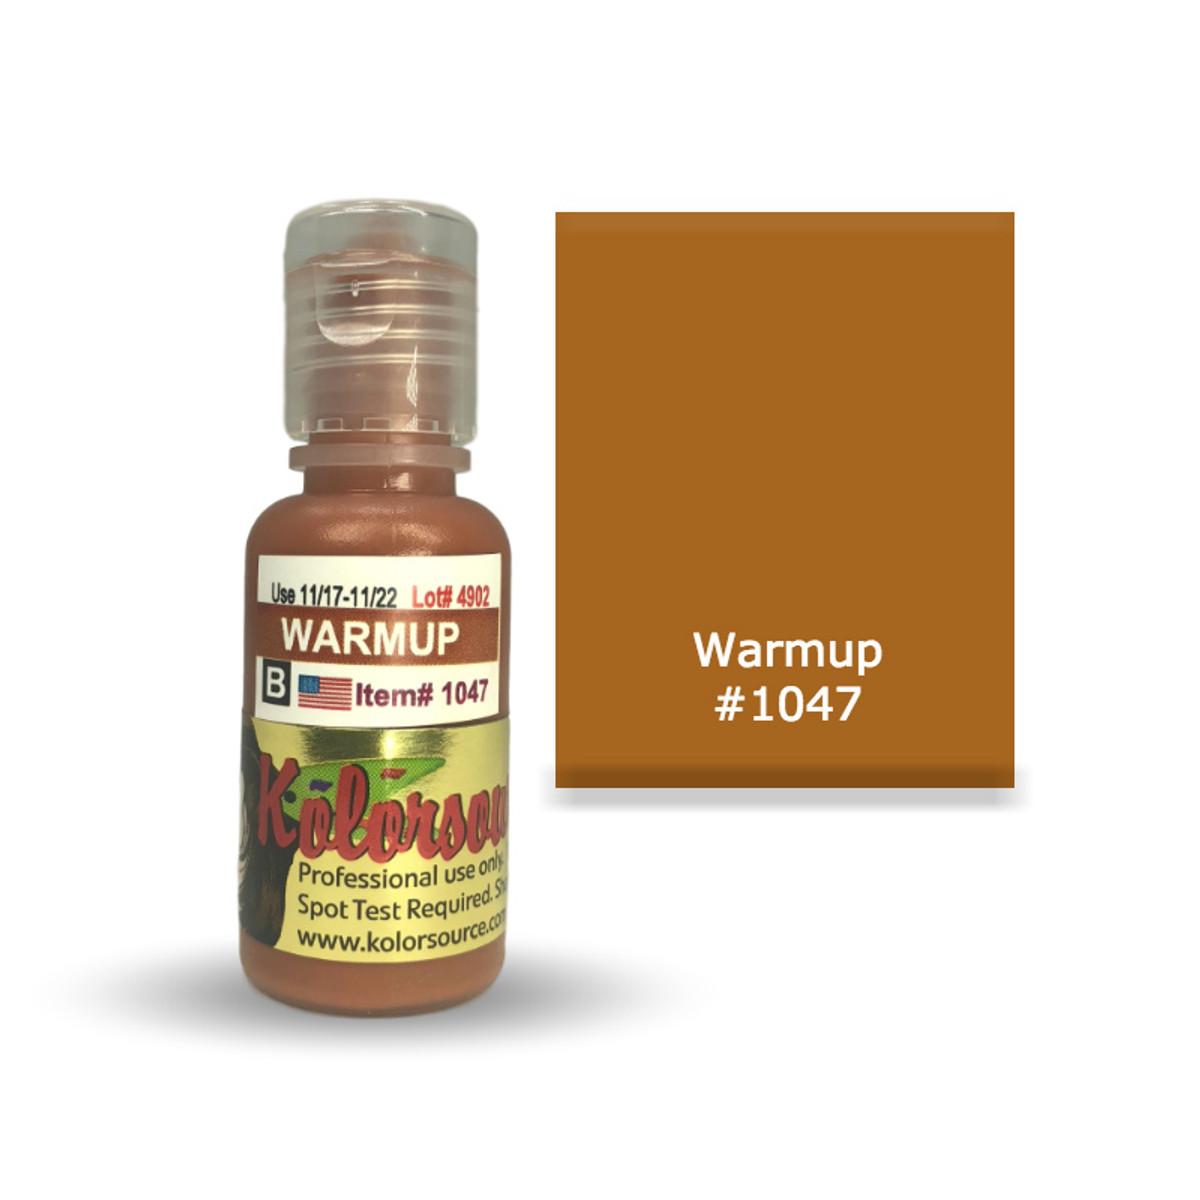 Kolorsource Permanent Makeup Pigment (PMU) Warmup Modifier #1047 - 15ml